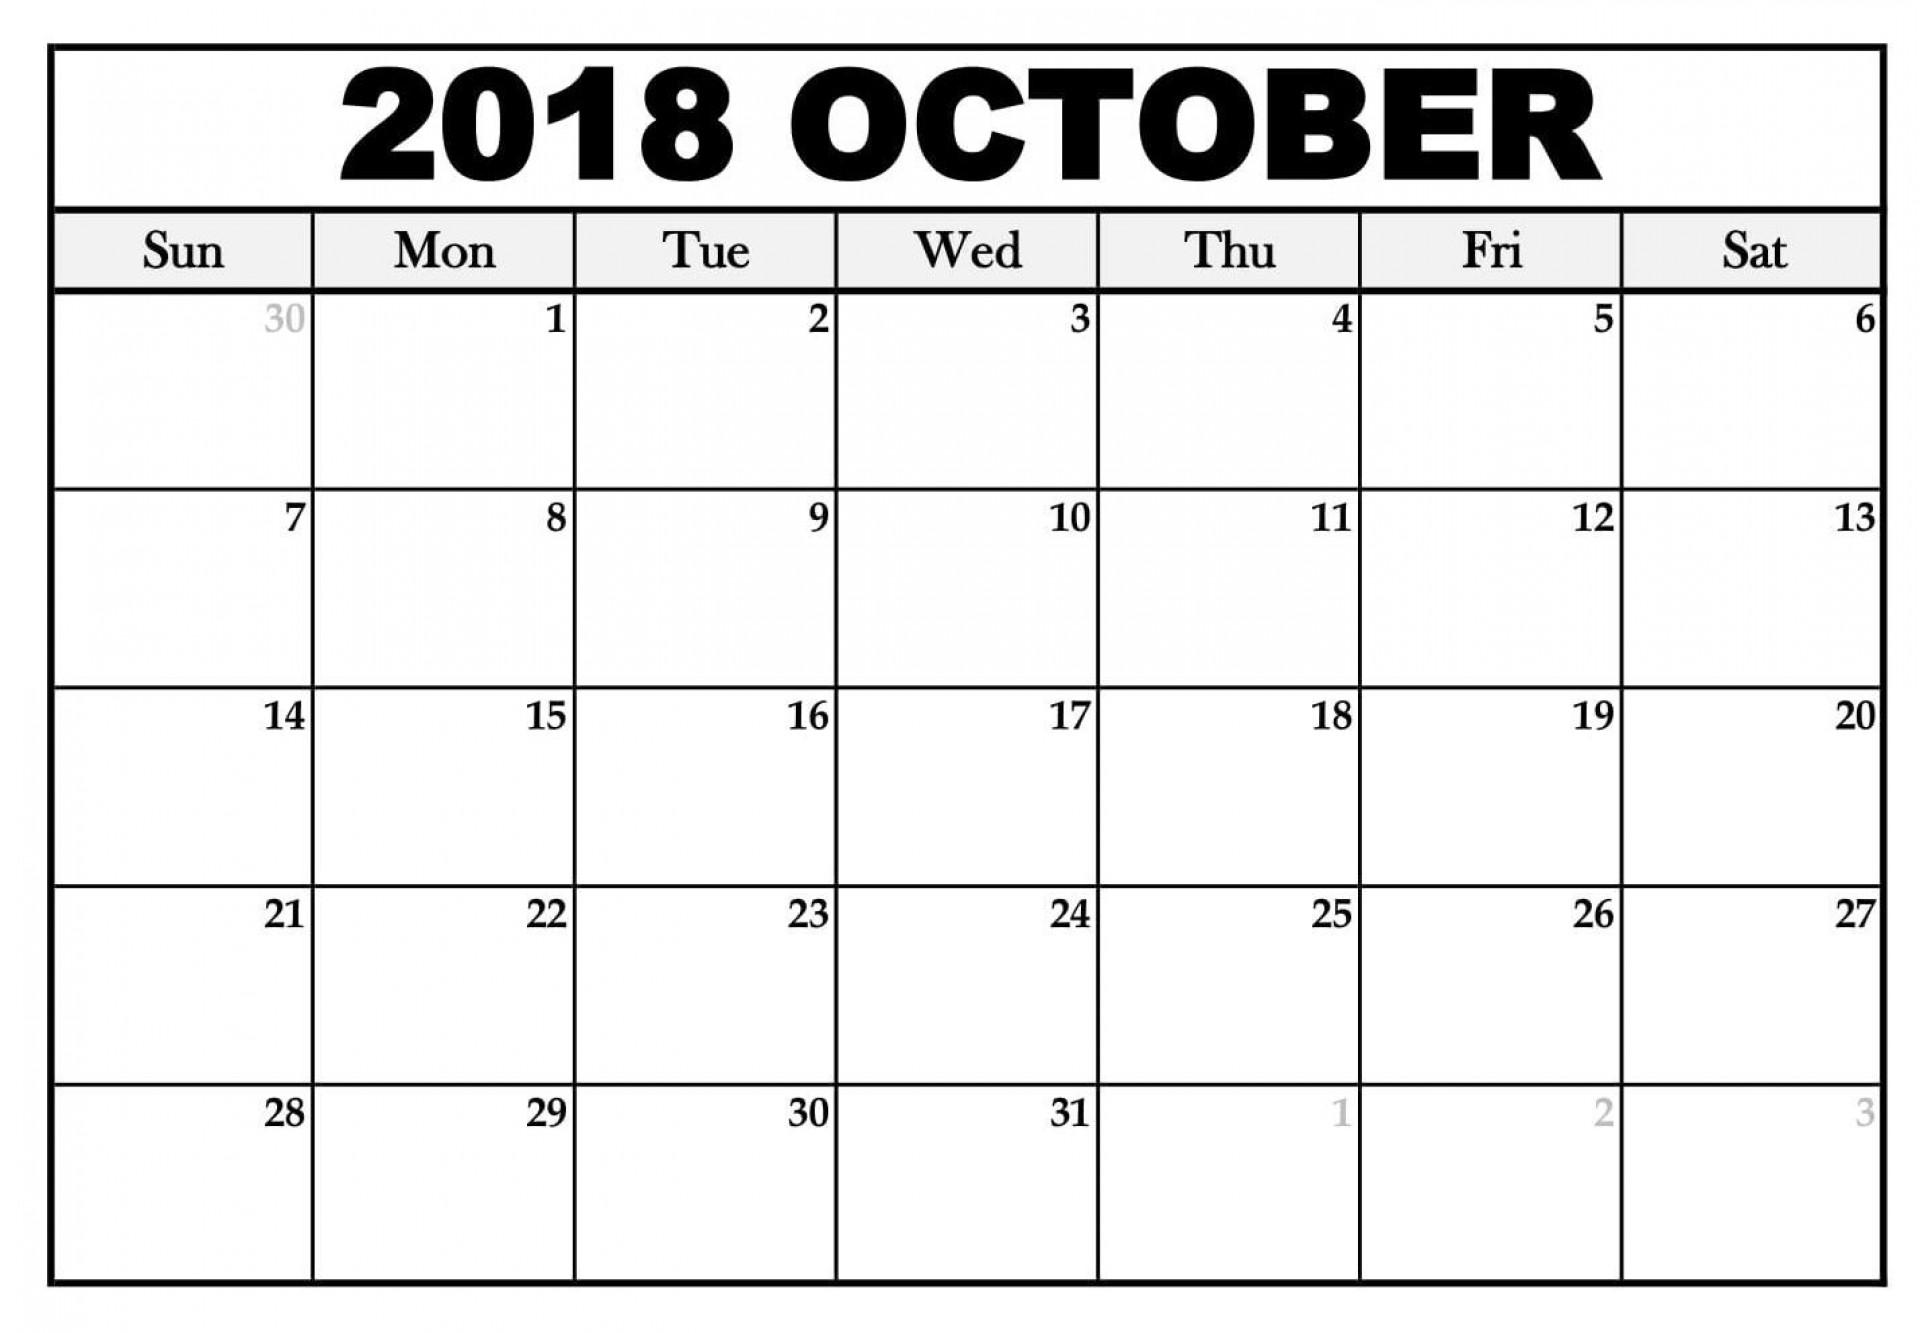 005 Simple Calendar Template October 2018 Word Concept 1920